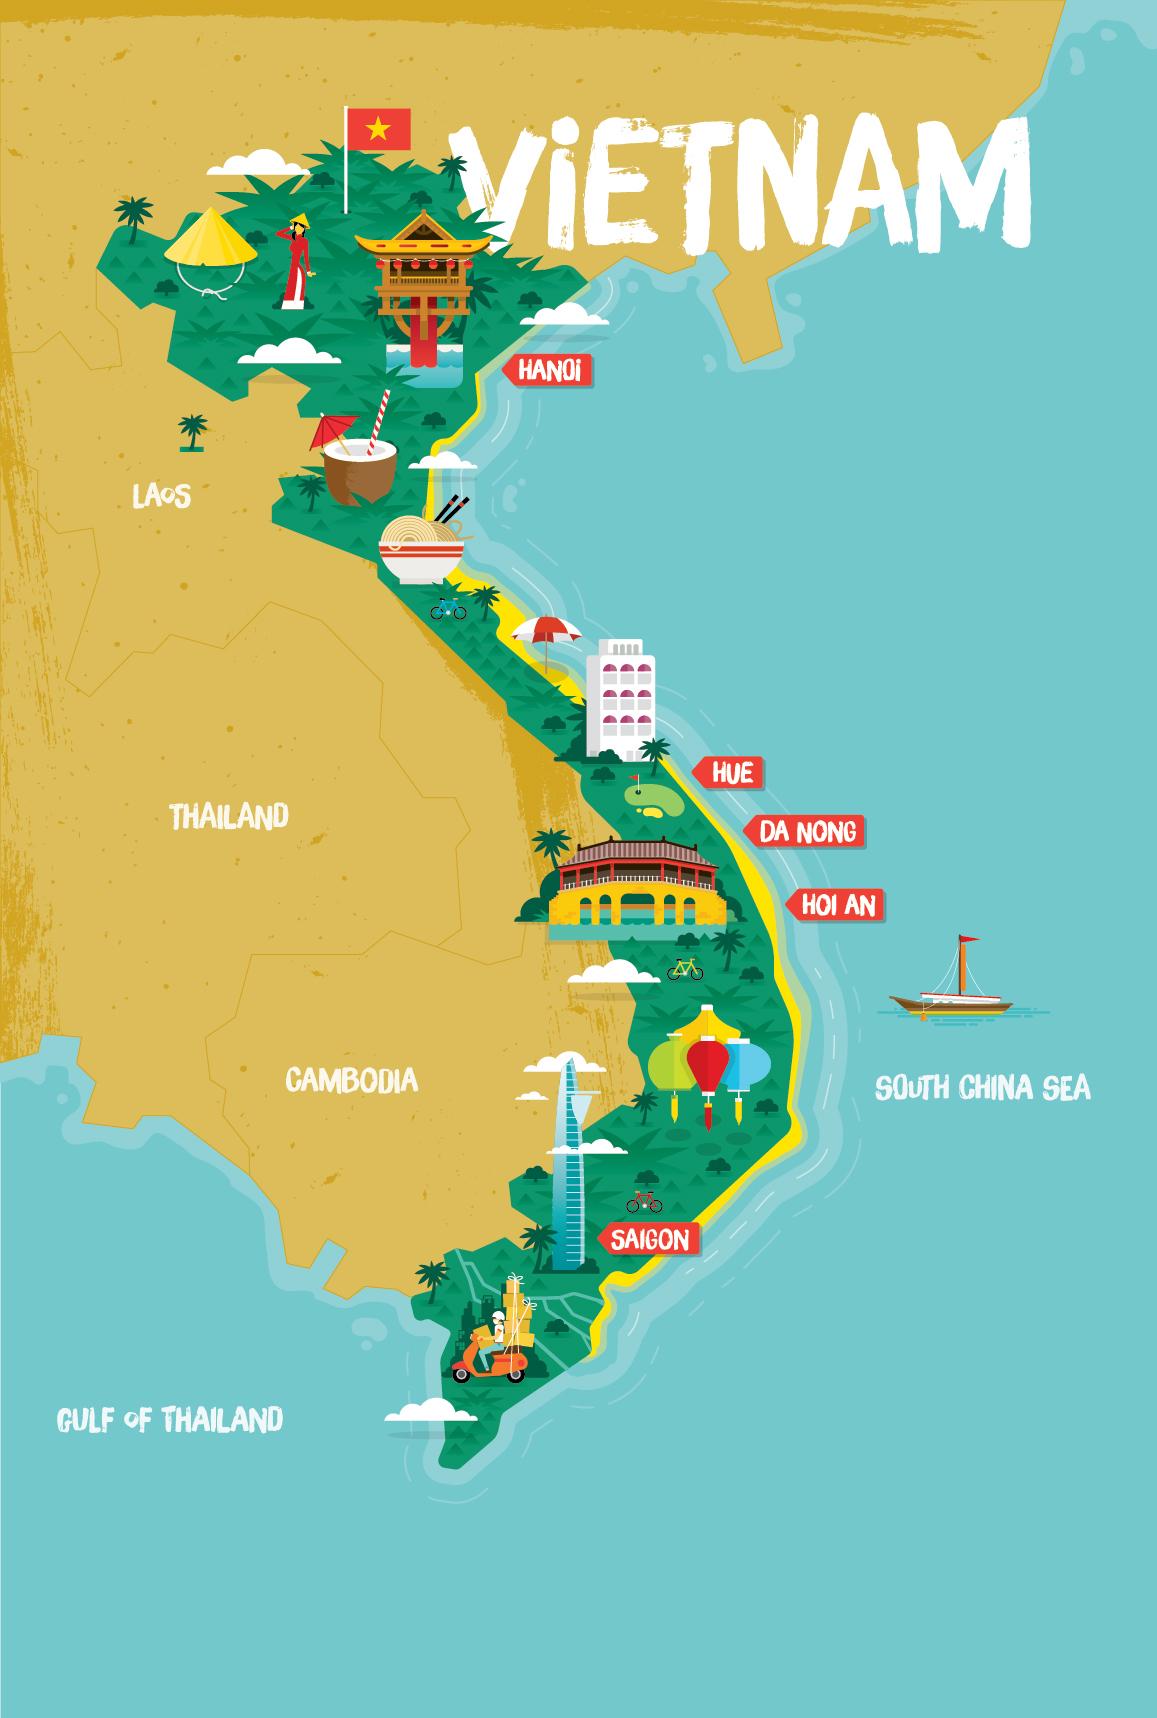 Vietnam Tourist Map on Behance